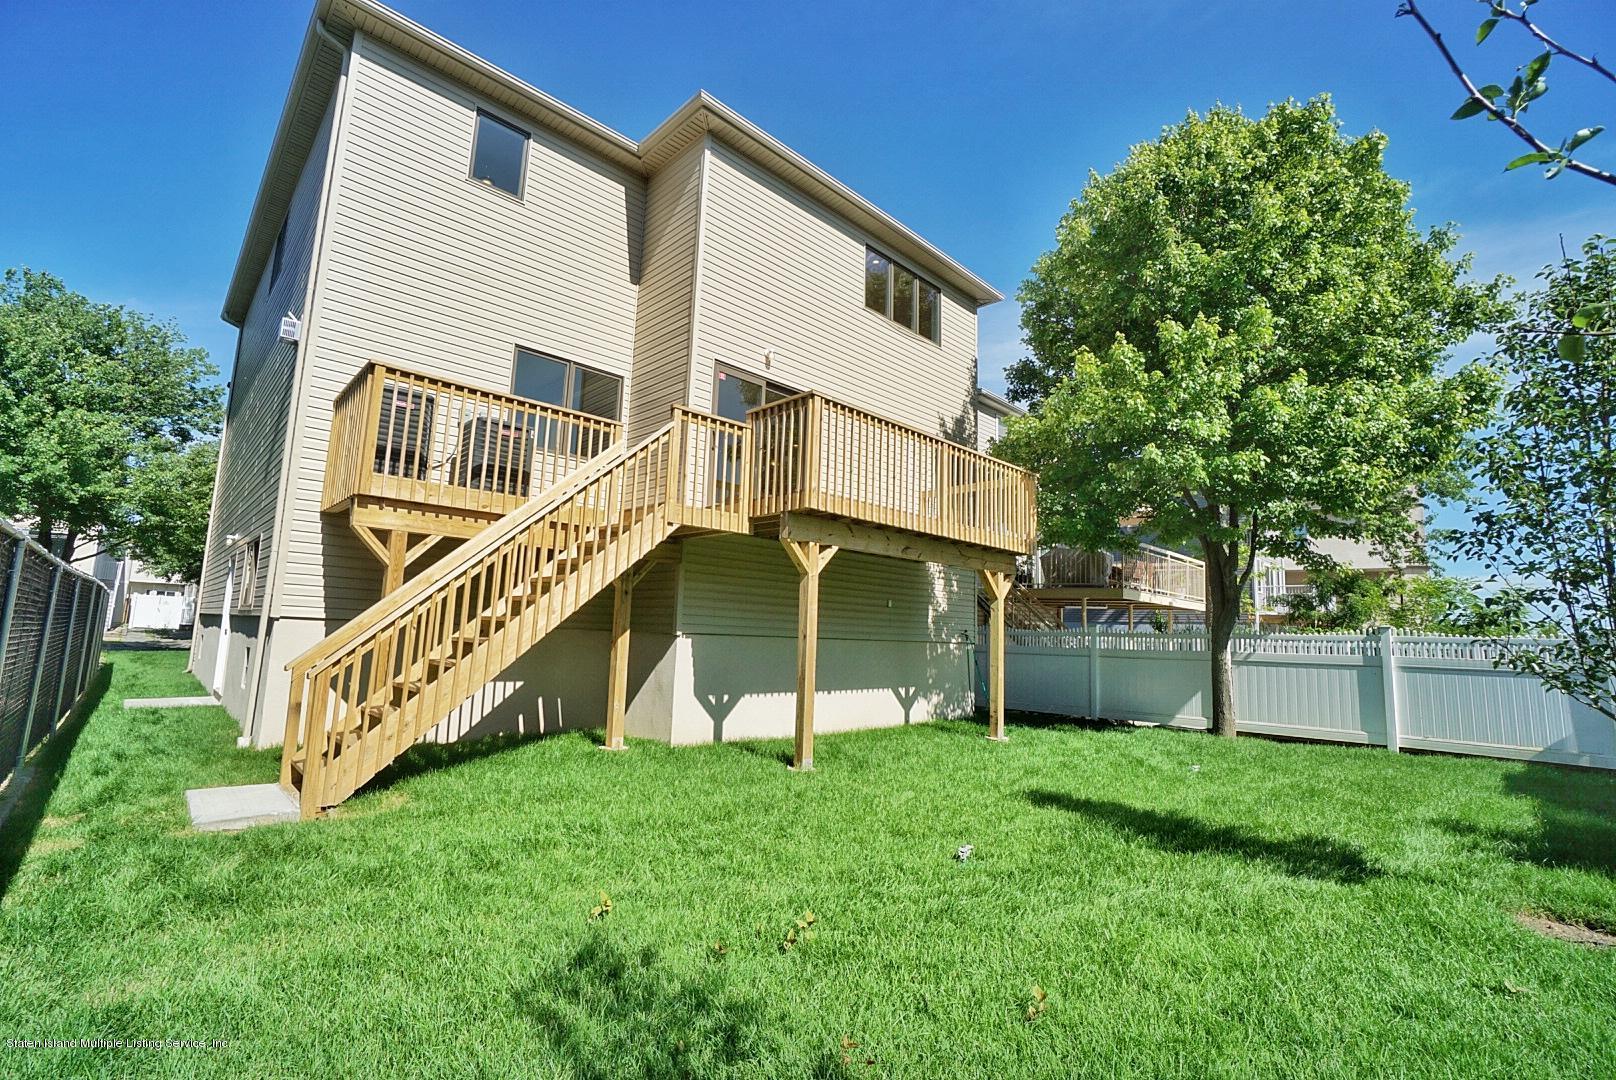 Single Family - Detached 678 Yetman Avenue  Staten Island, NY 10307, MLS-1132766-66